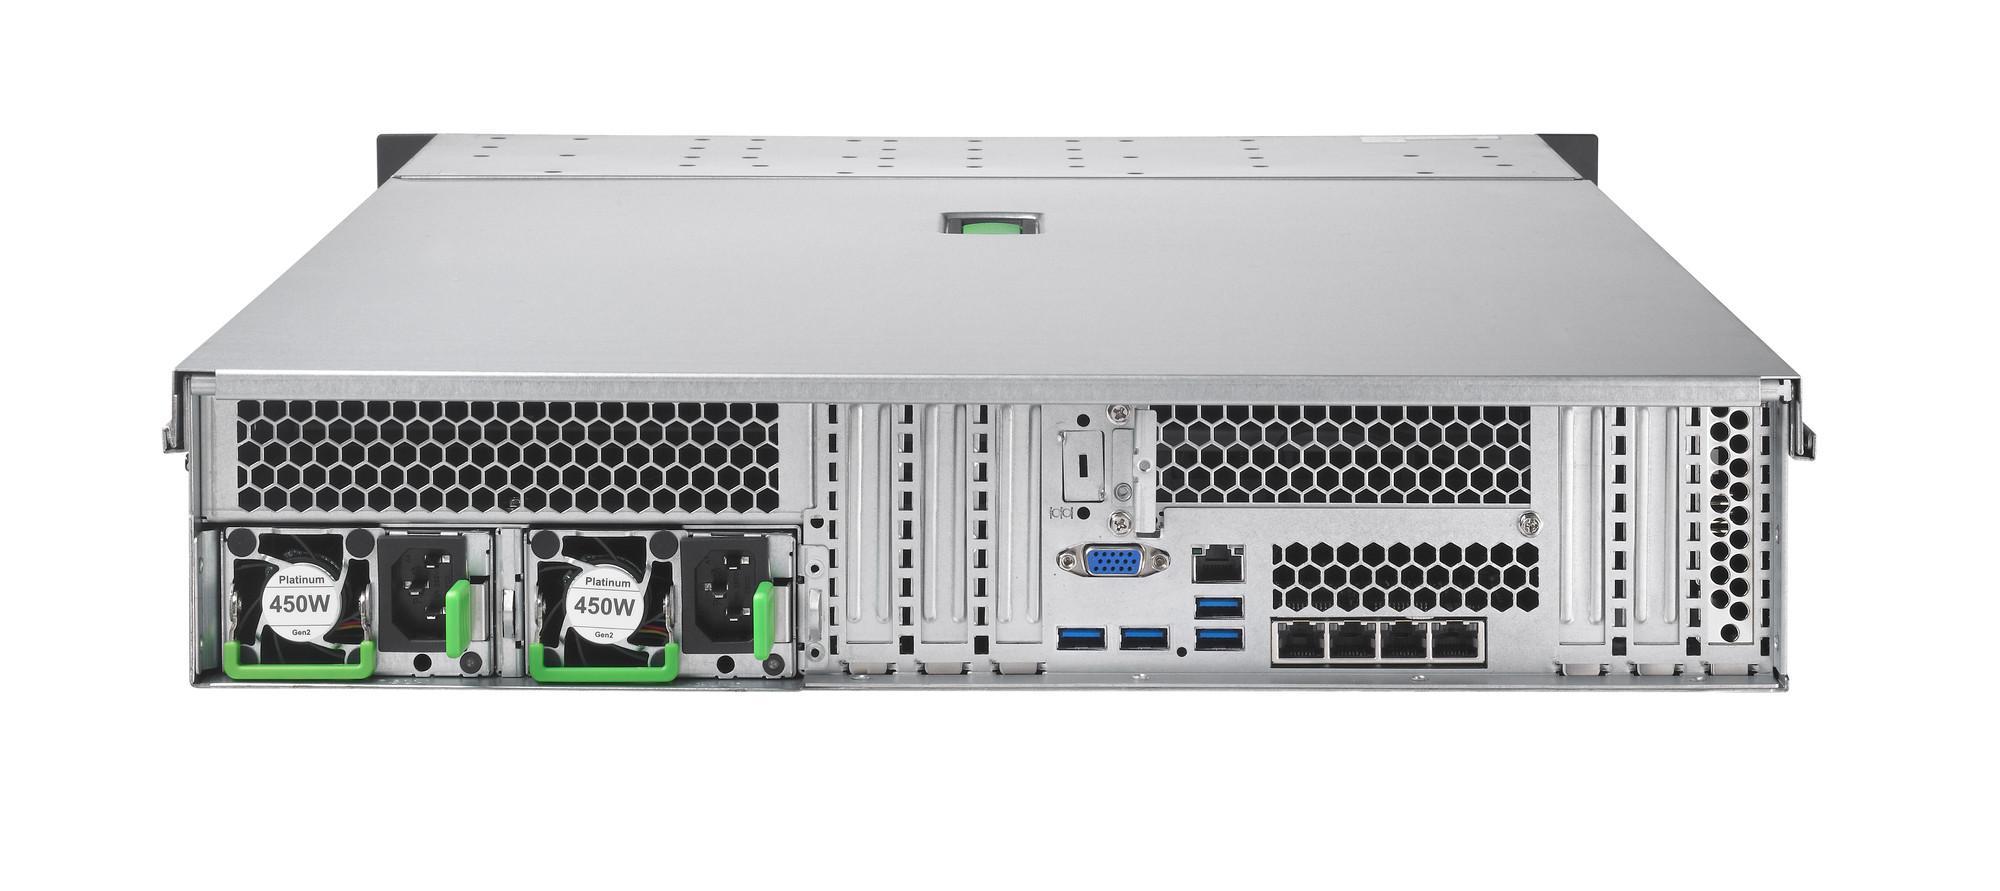 "Сървър Fujitsu Primergy RX2540M2 LFF Intel Xeon E5-2620v4/16GB/8X3.5""EXP/RAID12G 2GB/LAN4X1GB/PSU 450W"